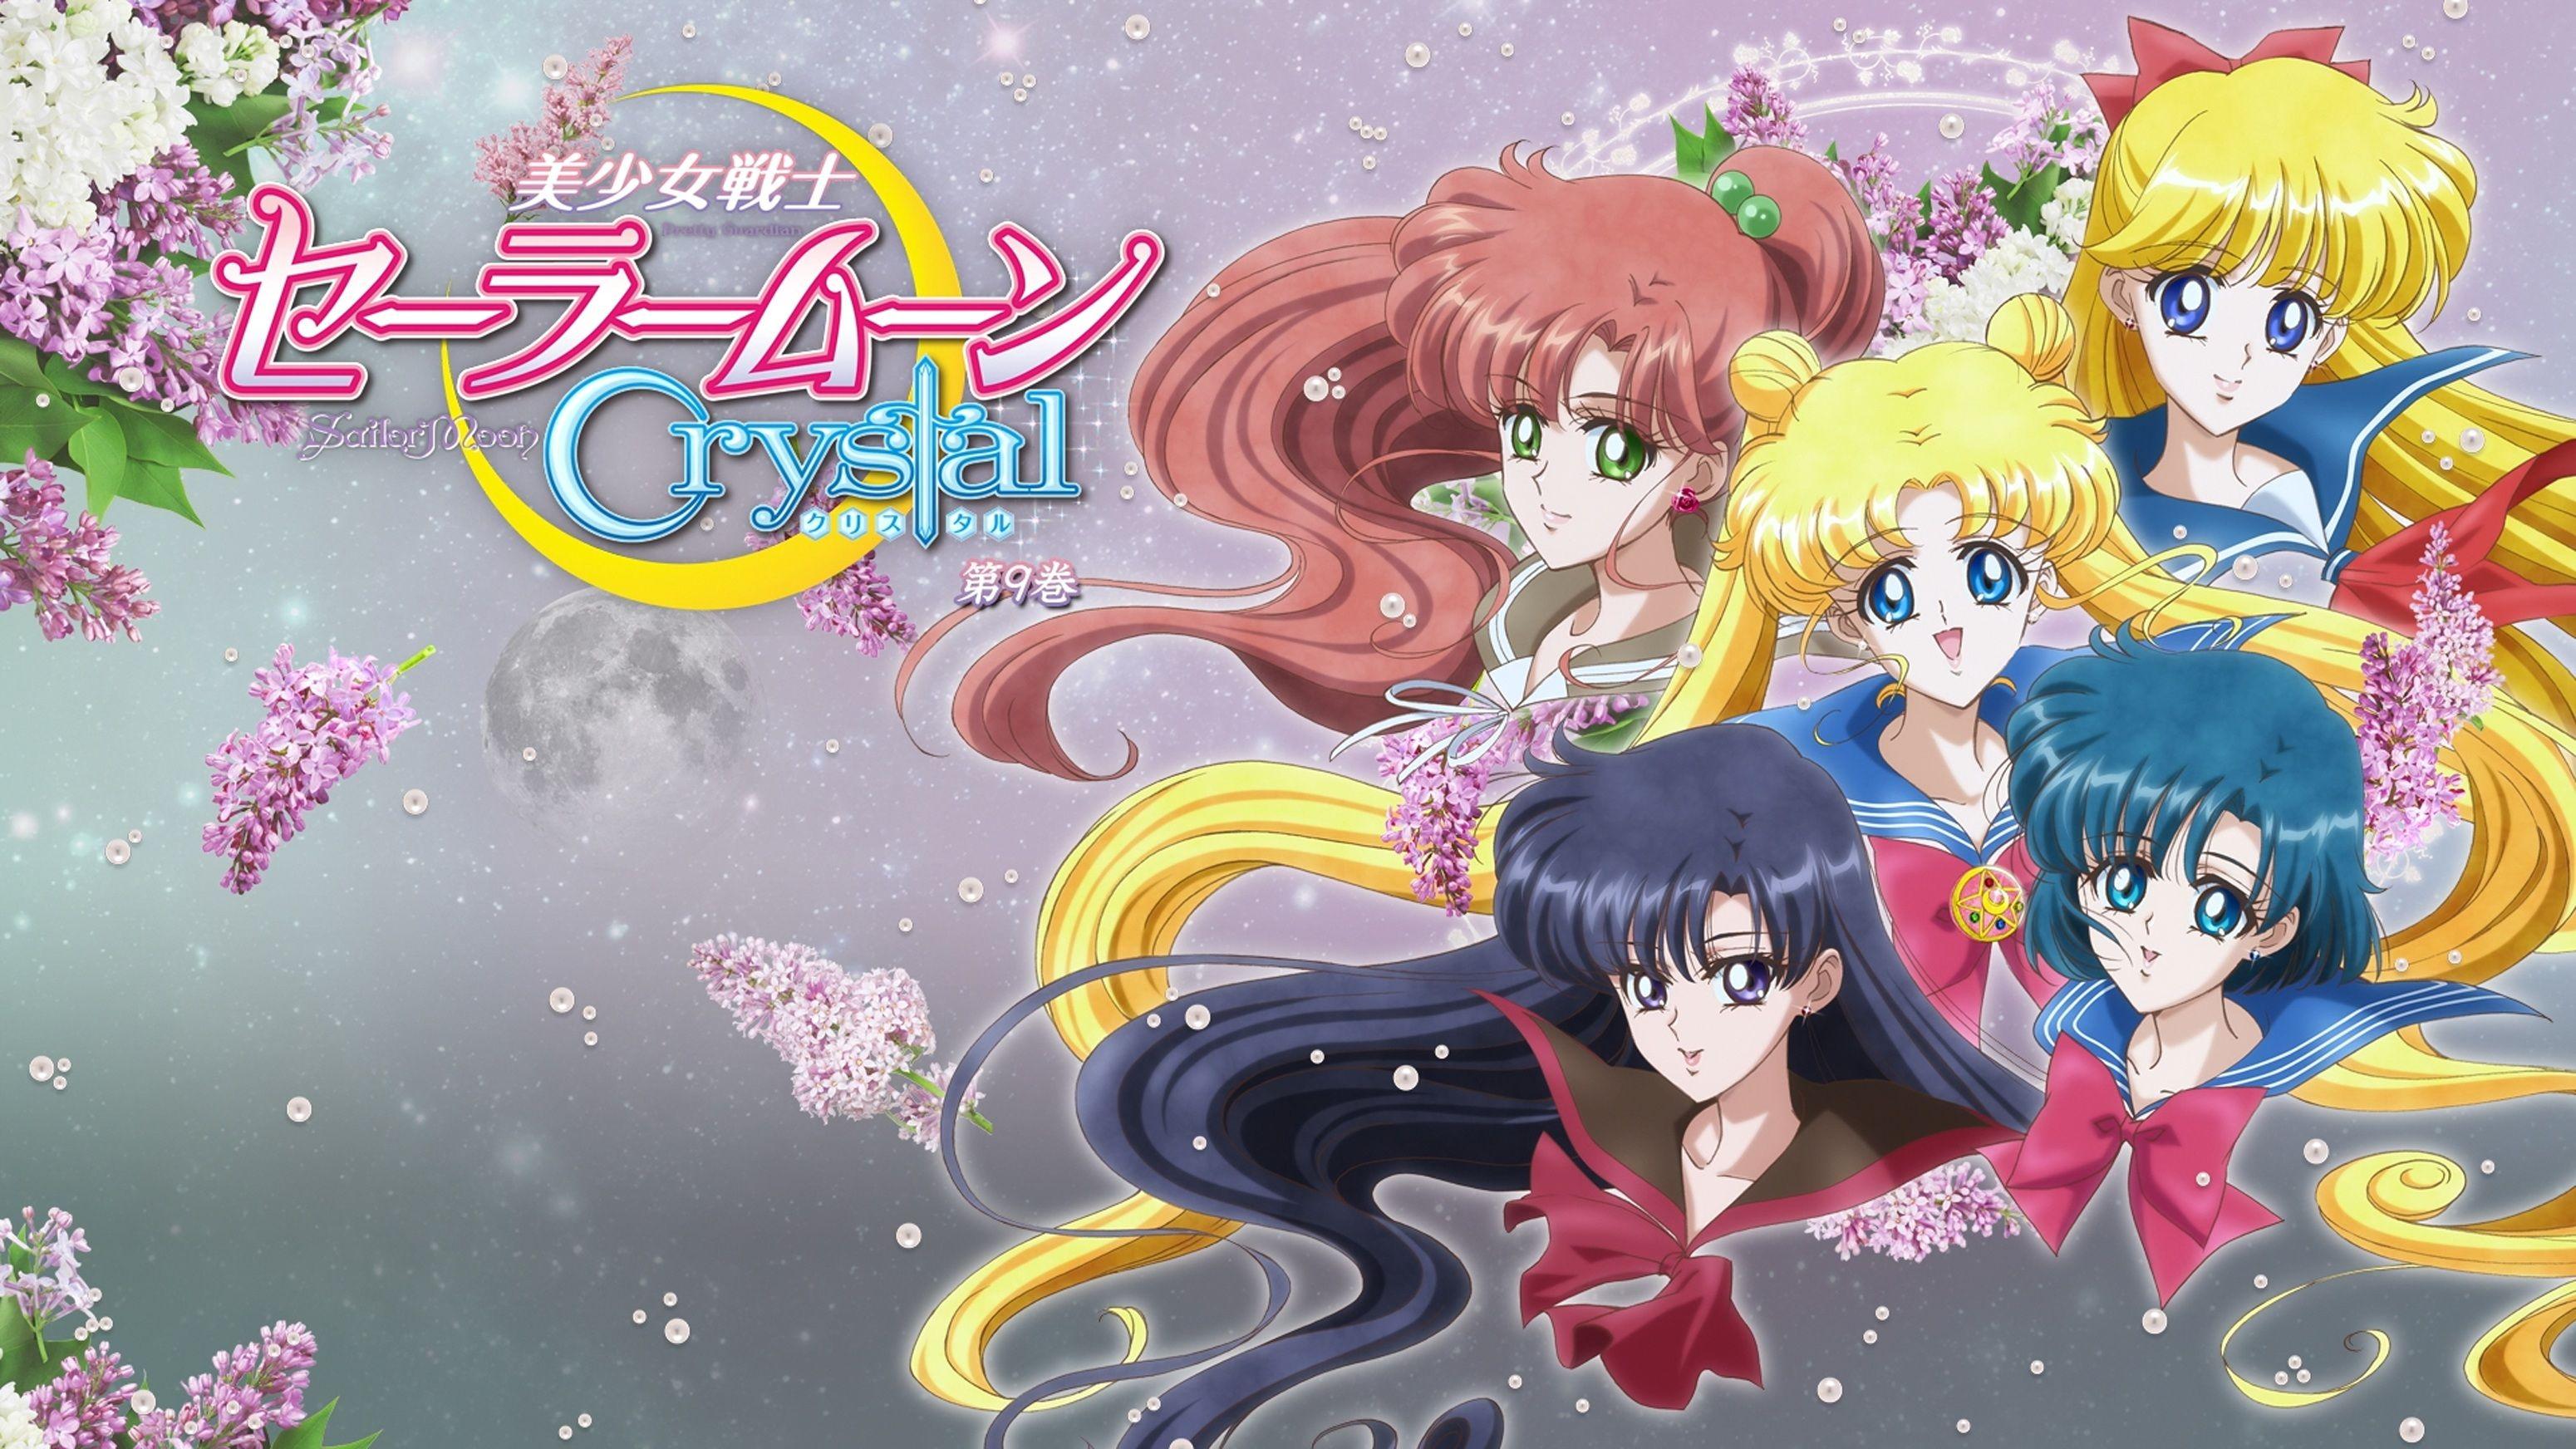 Wallpaper HD Sailor Moon Crystal DVD 9 세일러문